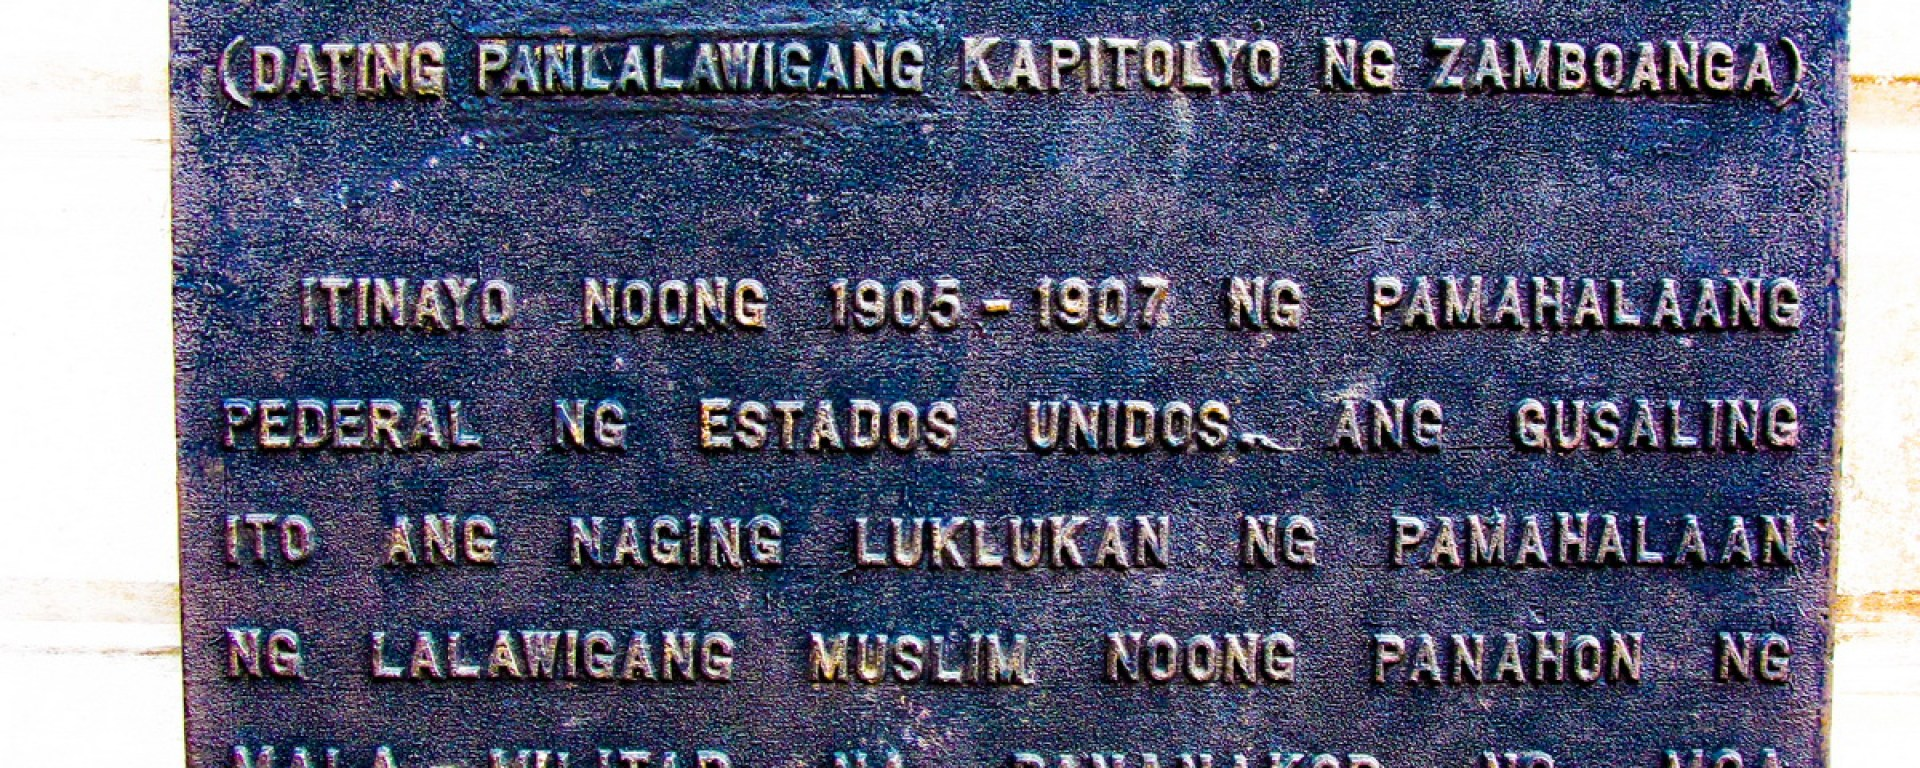 Pagadian Zamboanga Del Sur, Pagadian, Pagadian, Philippines.